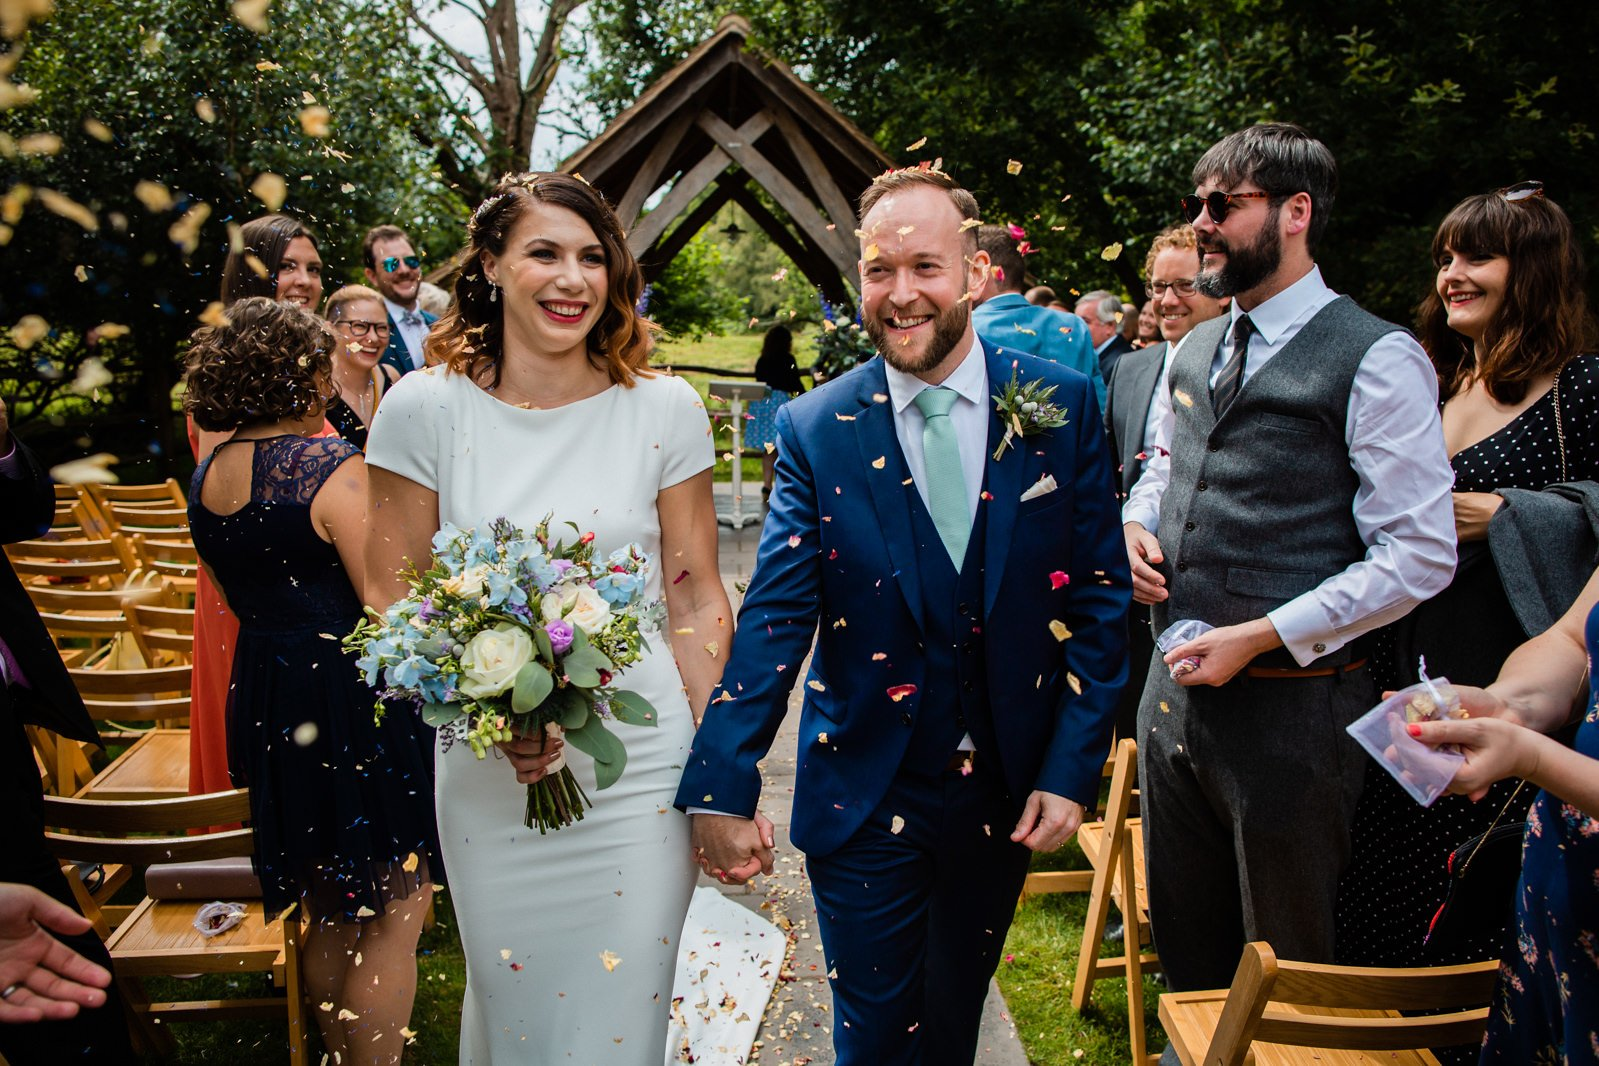 Millbridge Court Wedding - stunning summer wedding - wedding photography 62